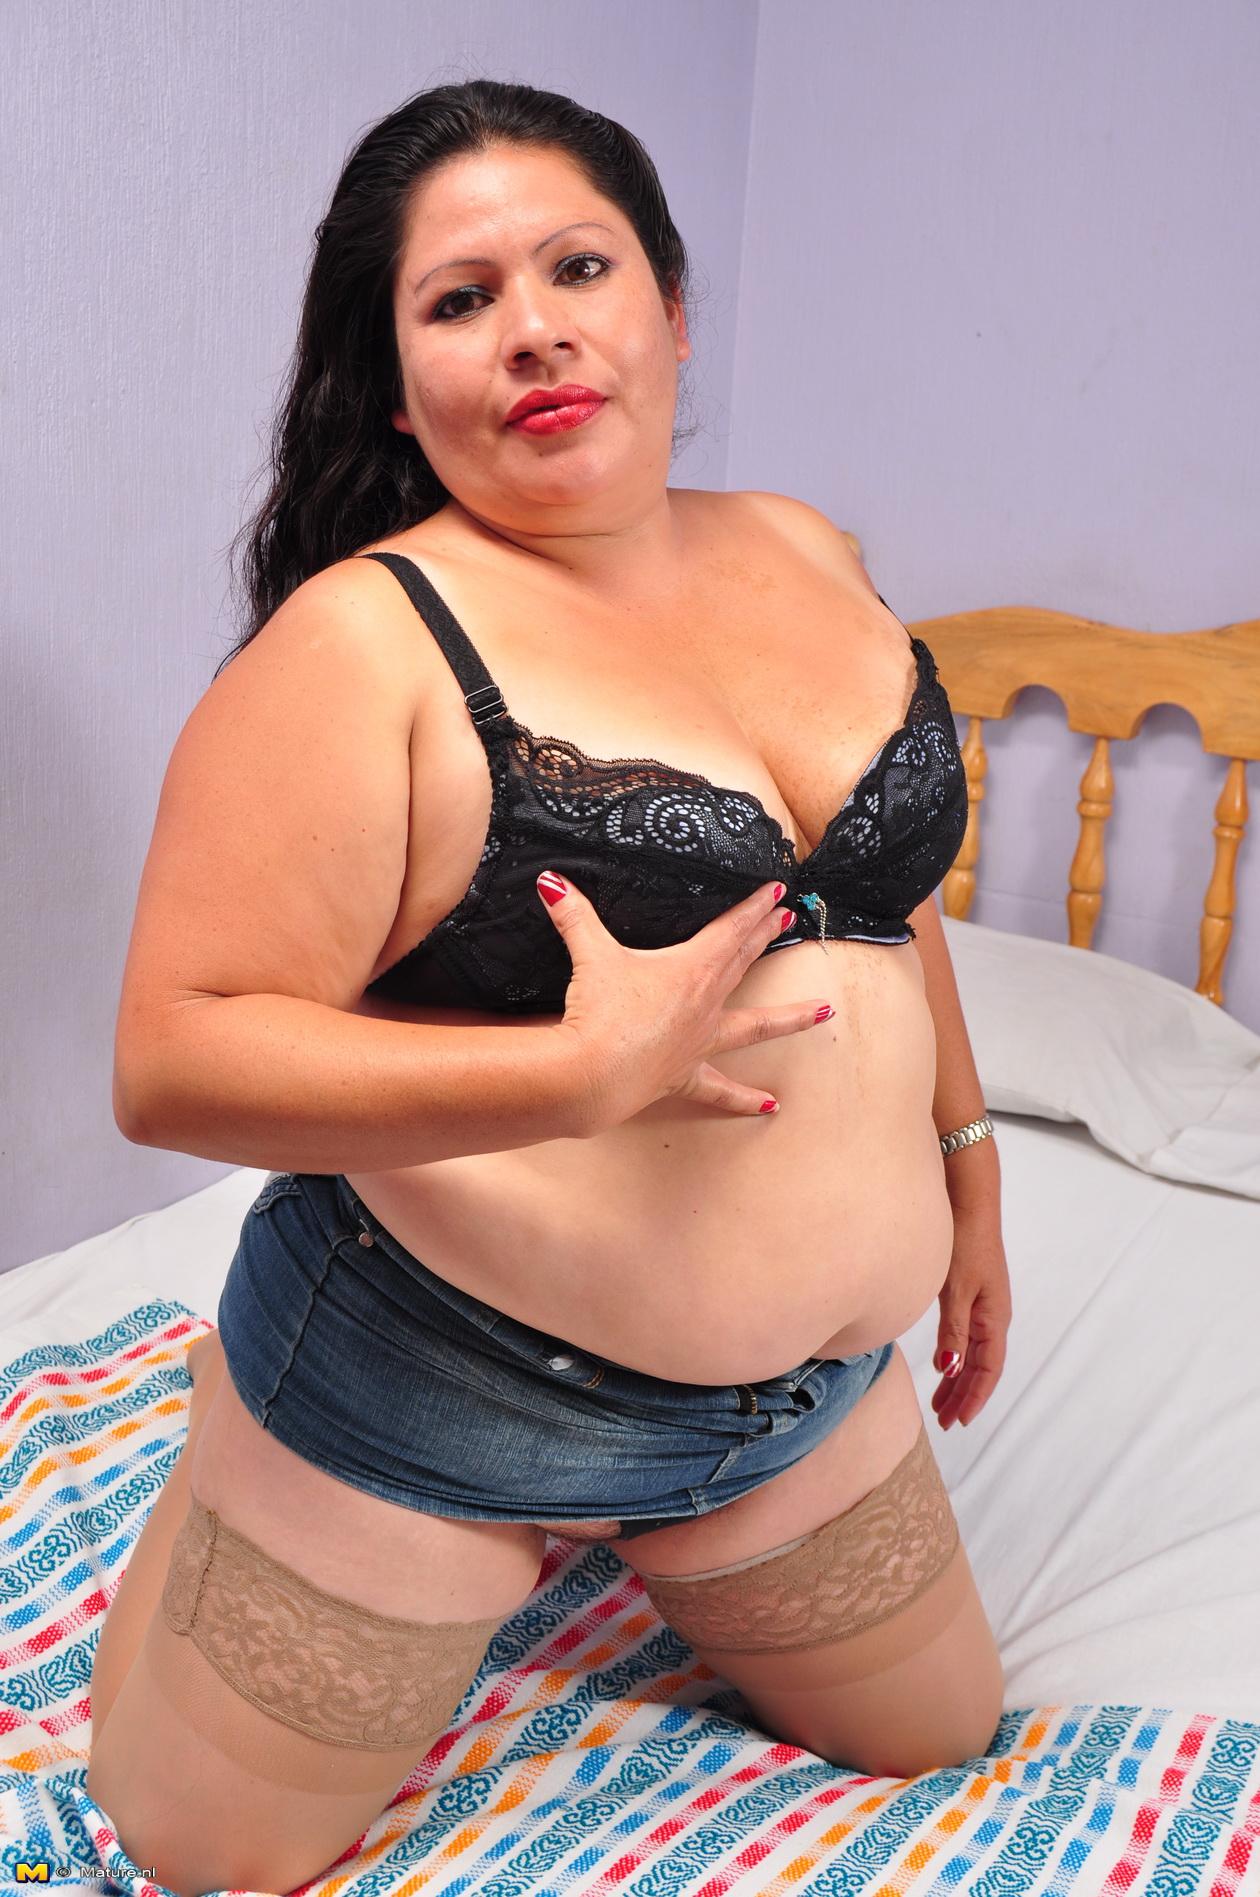 Cubby latina